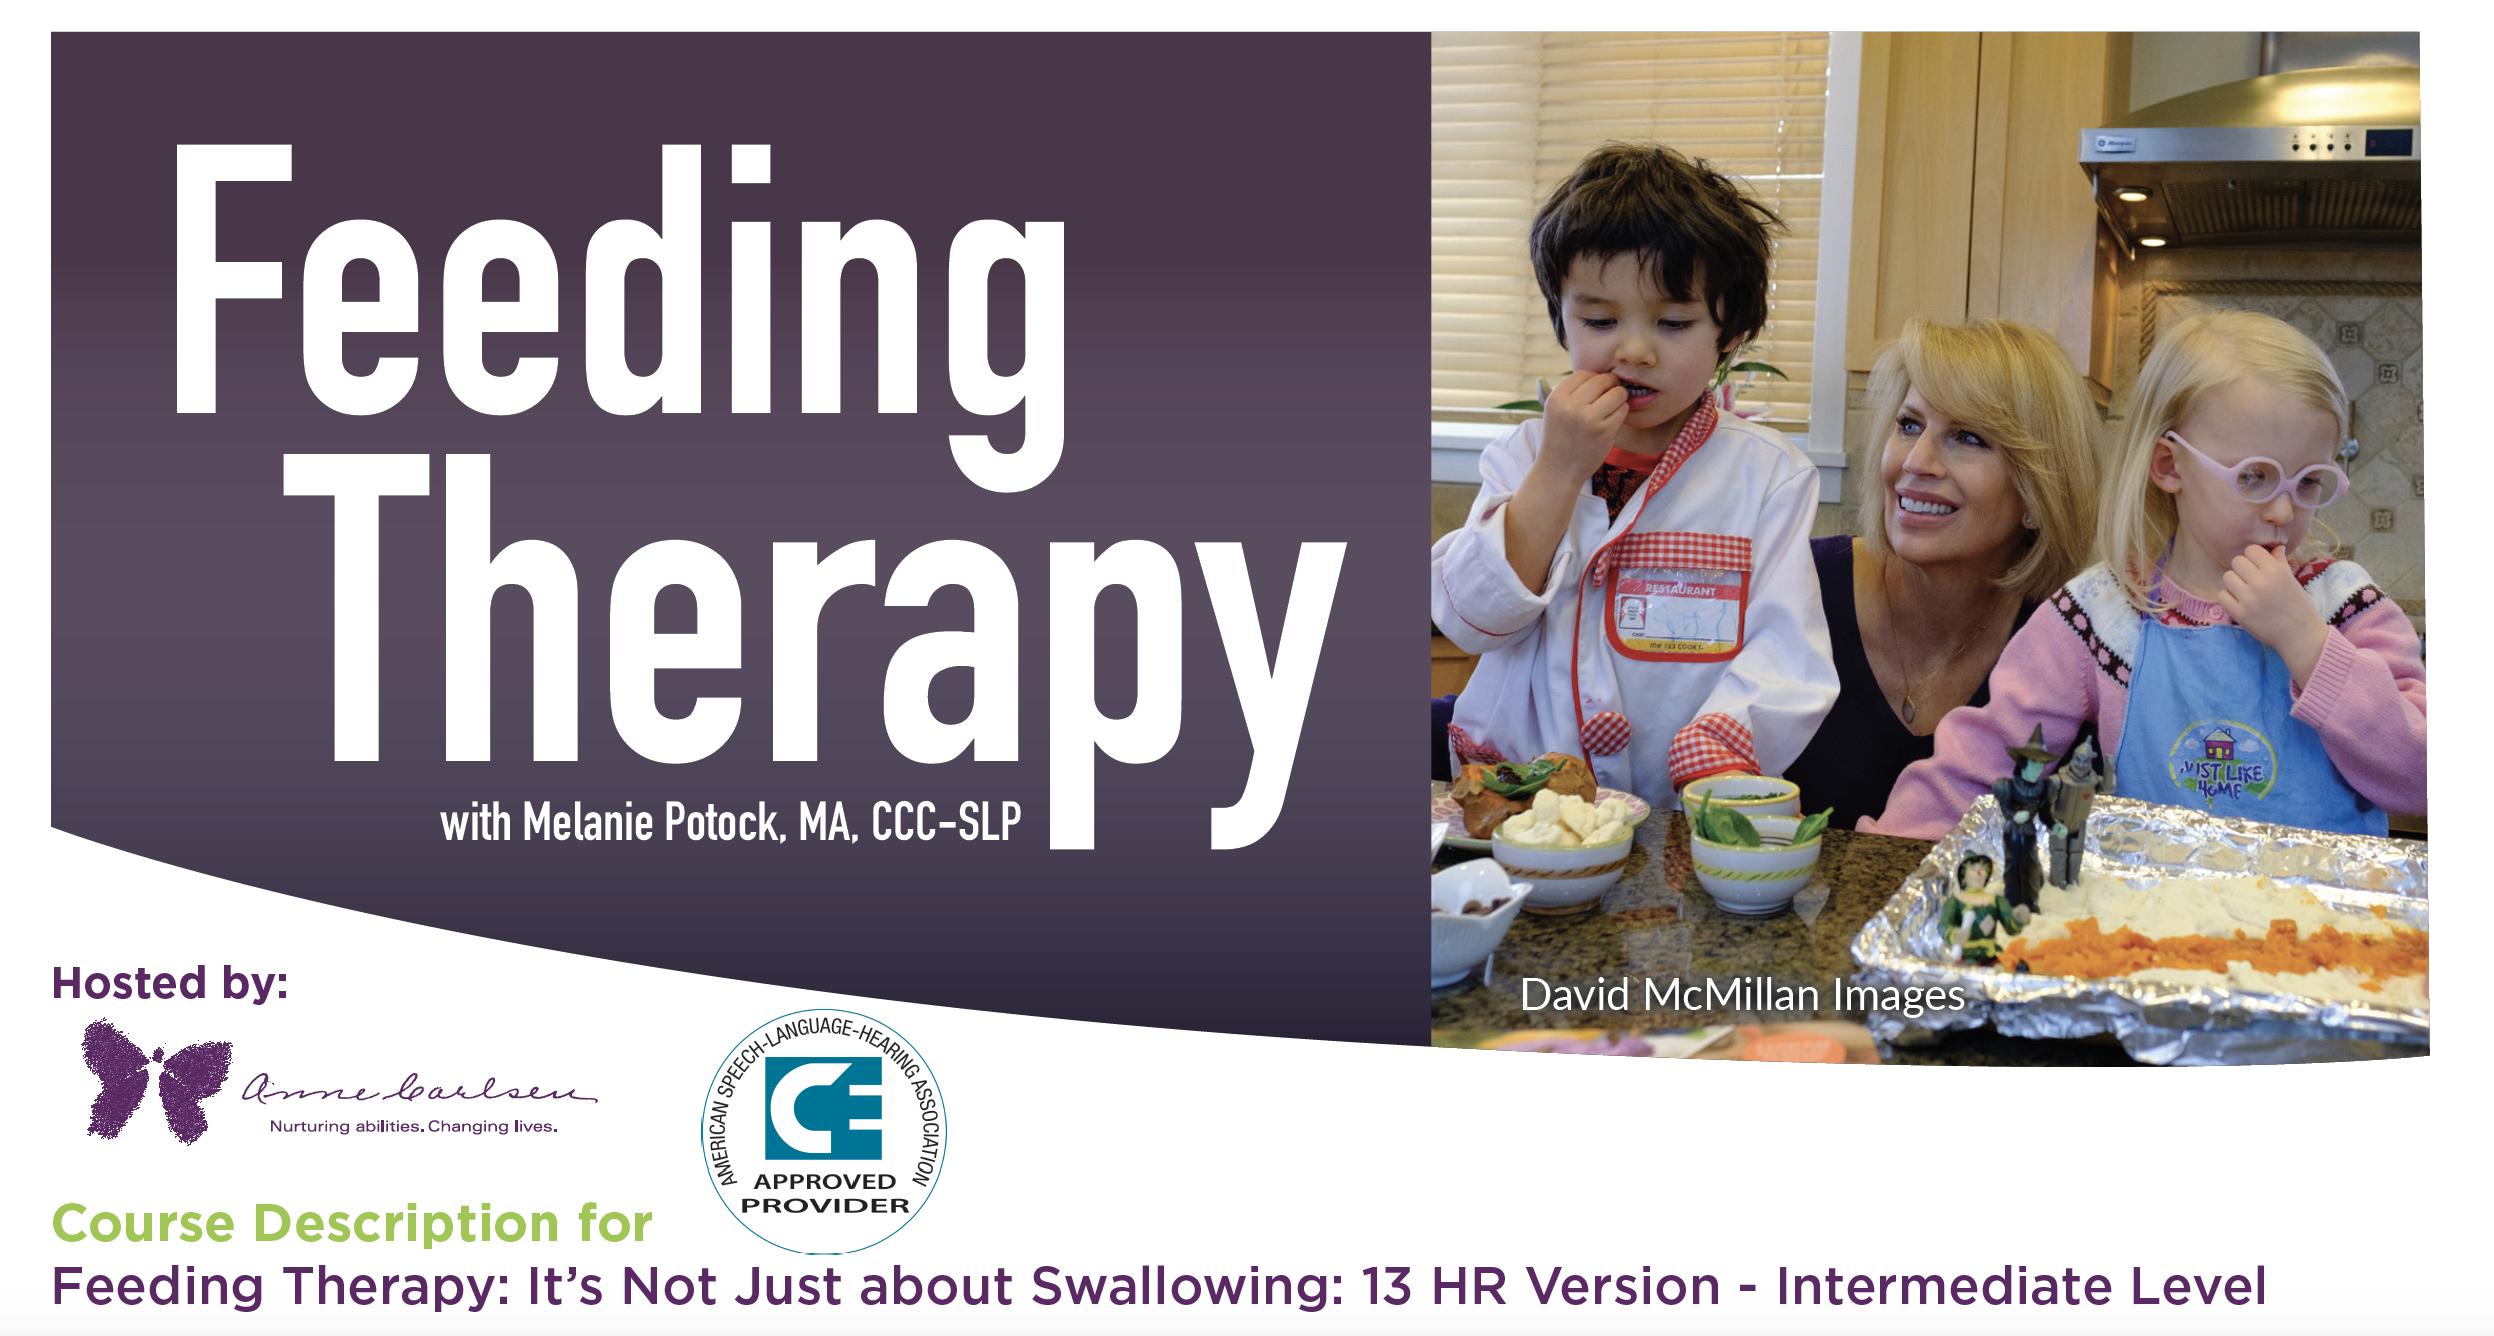 Feeding Therapy Event with Melanie Potock